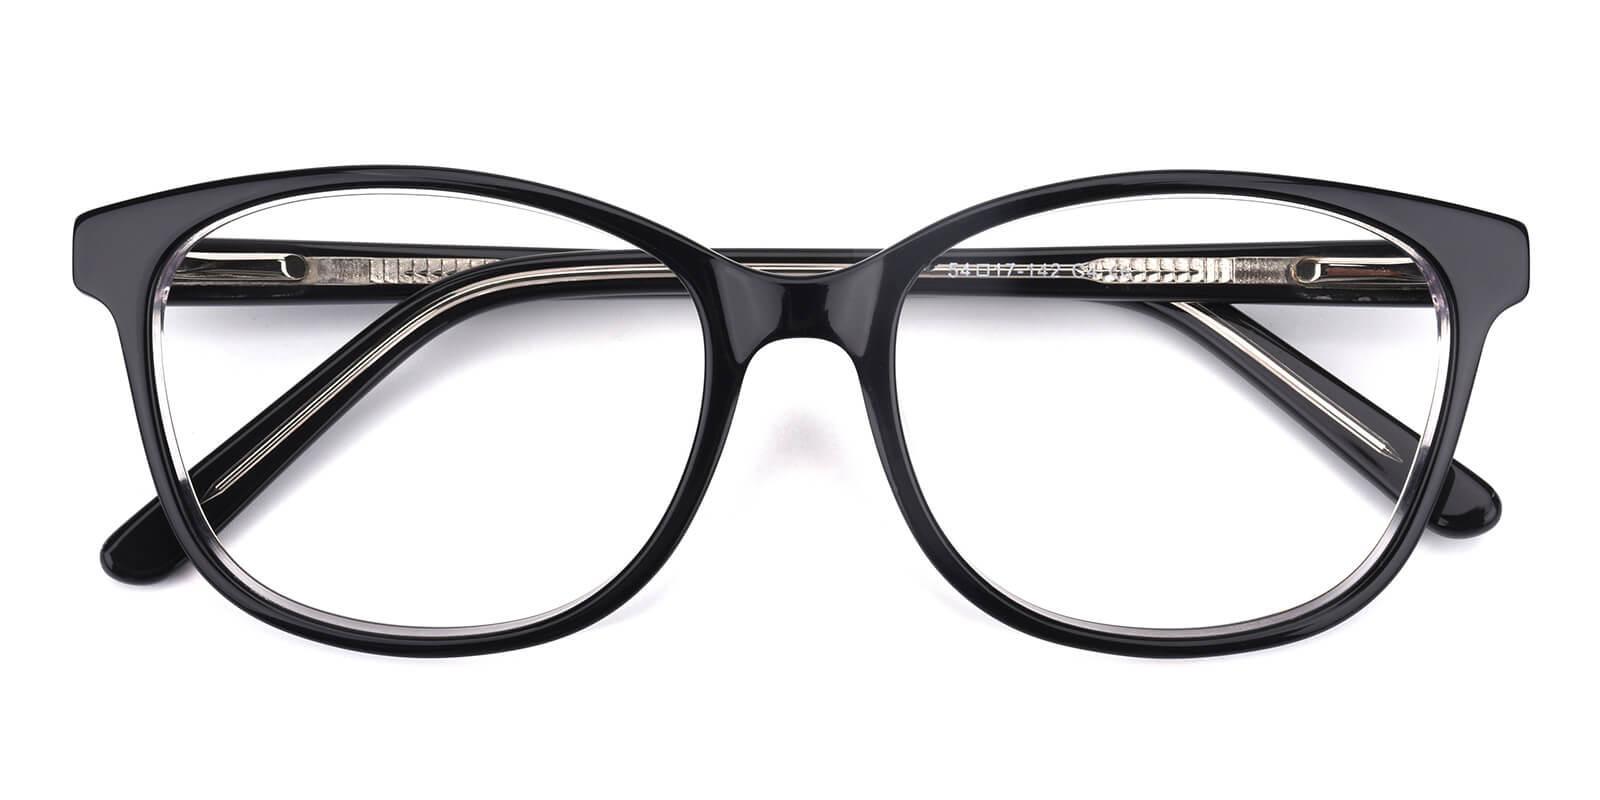 Bolivia-Pattern-Cat-Acetate-Eyeglasses-detail